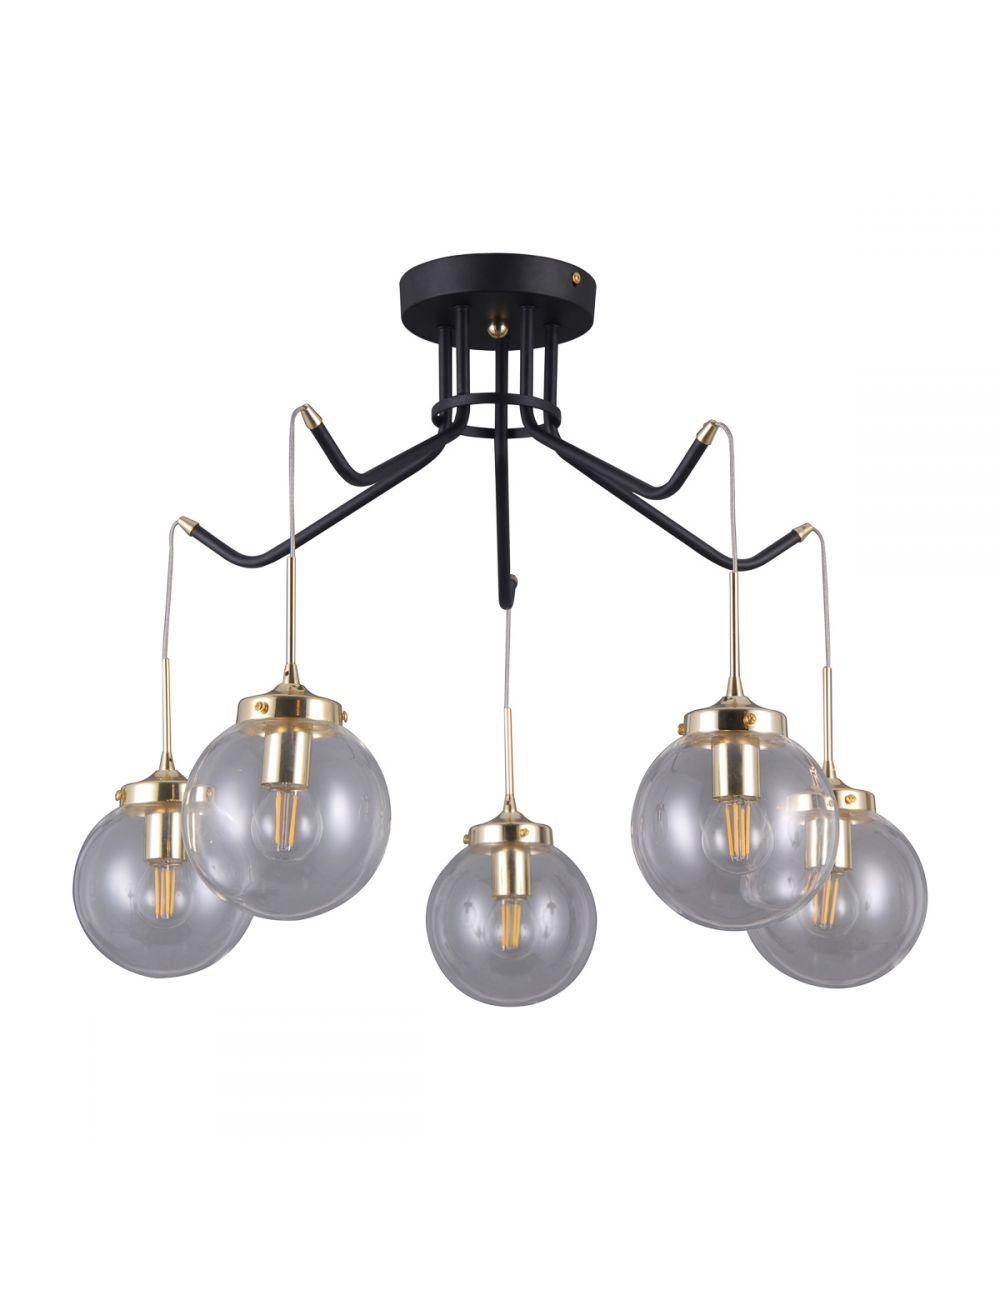 Lampa wisząca industrialna  Domenico 5 Italux PNPL-43232-5